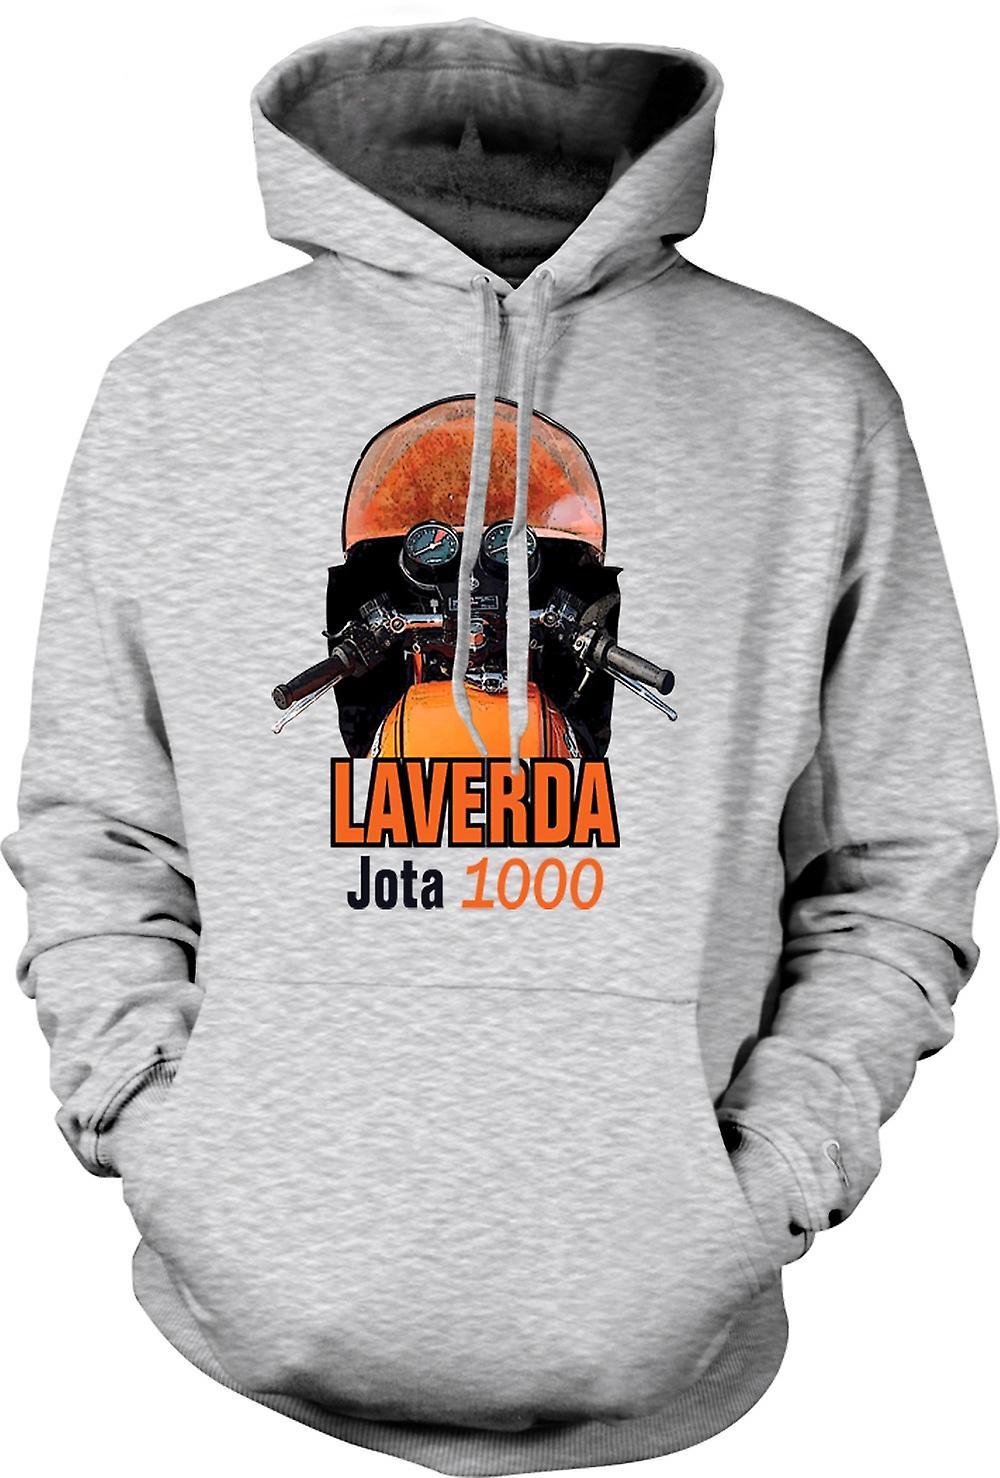 Mens Hoodie - moto d'epoca Laverda Jota 1000